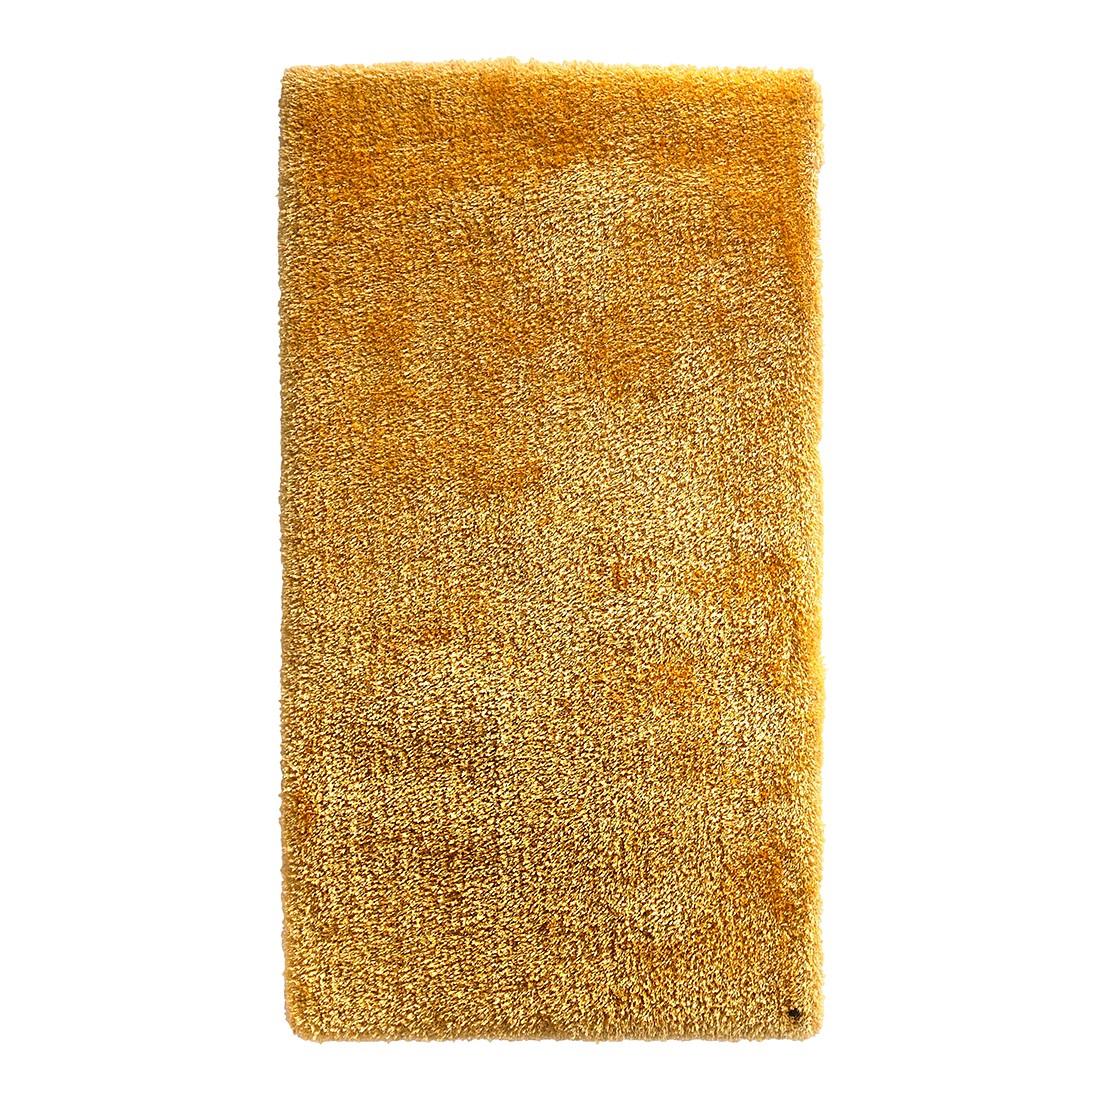 Home 24 - Tapis soft square - tournesol - 65 x 135 cm, tom tailor